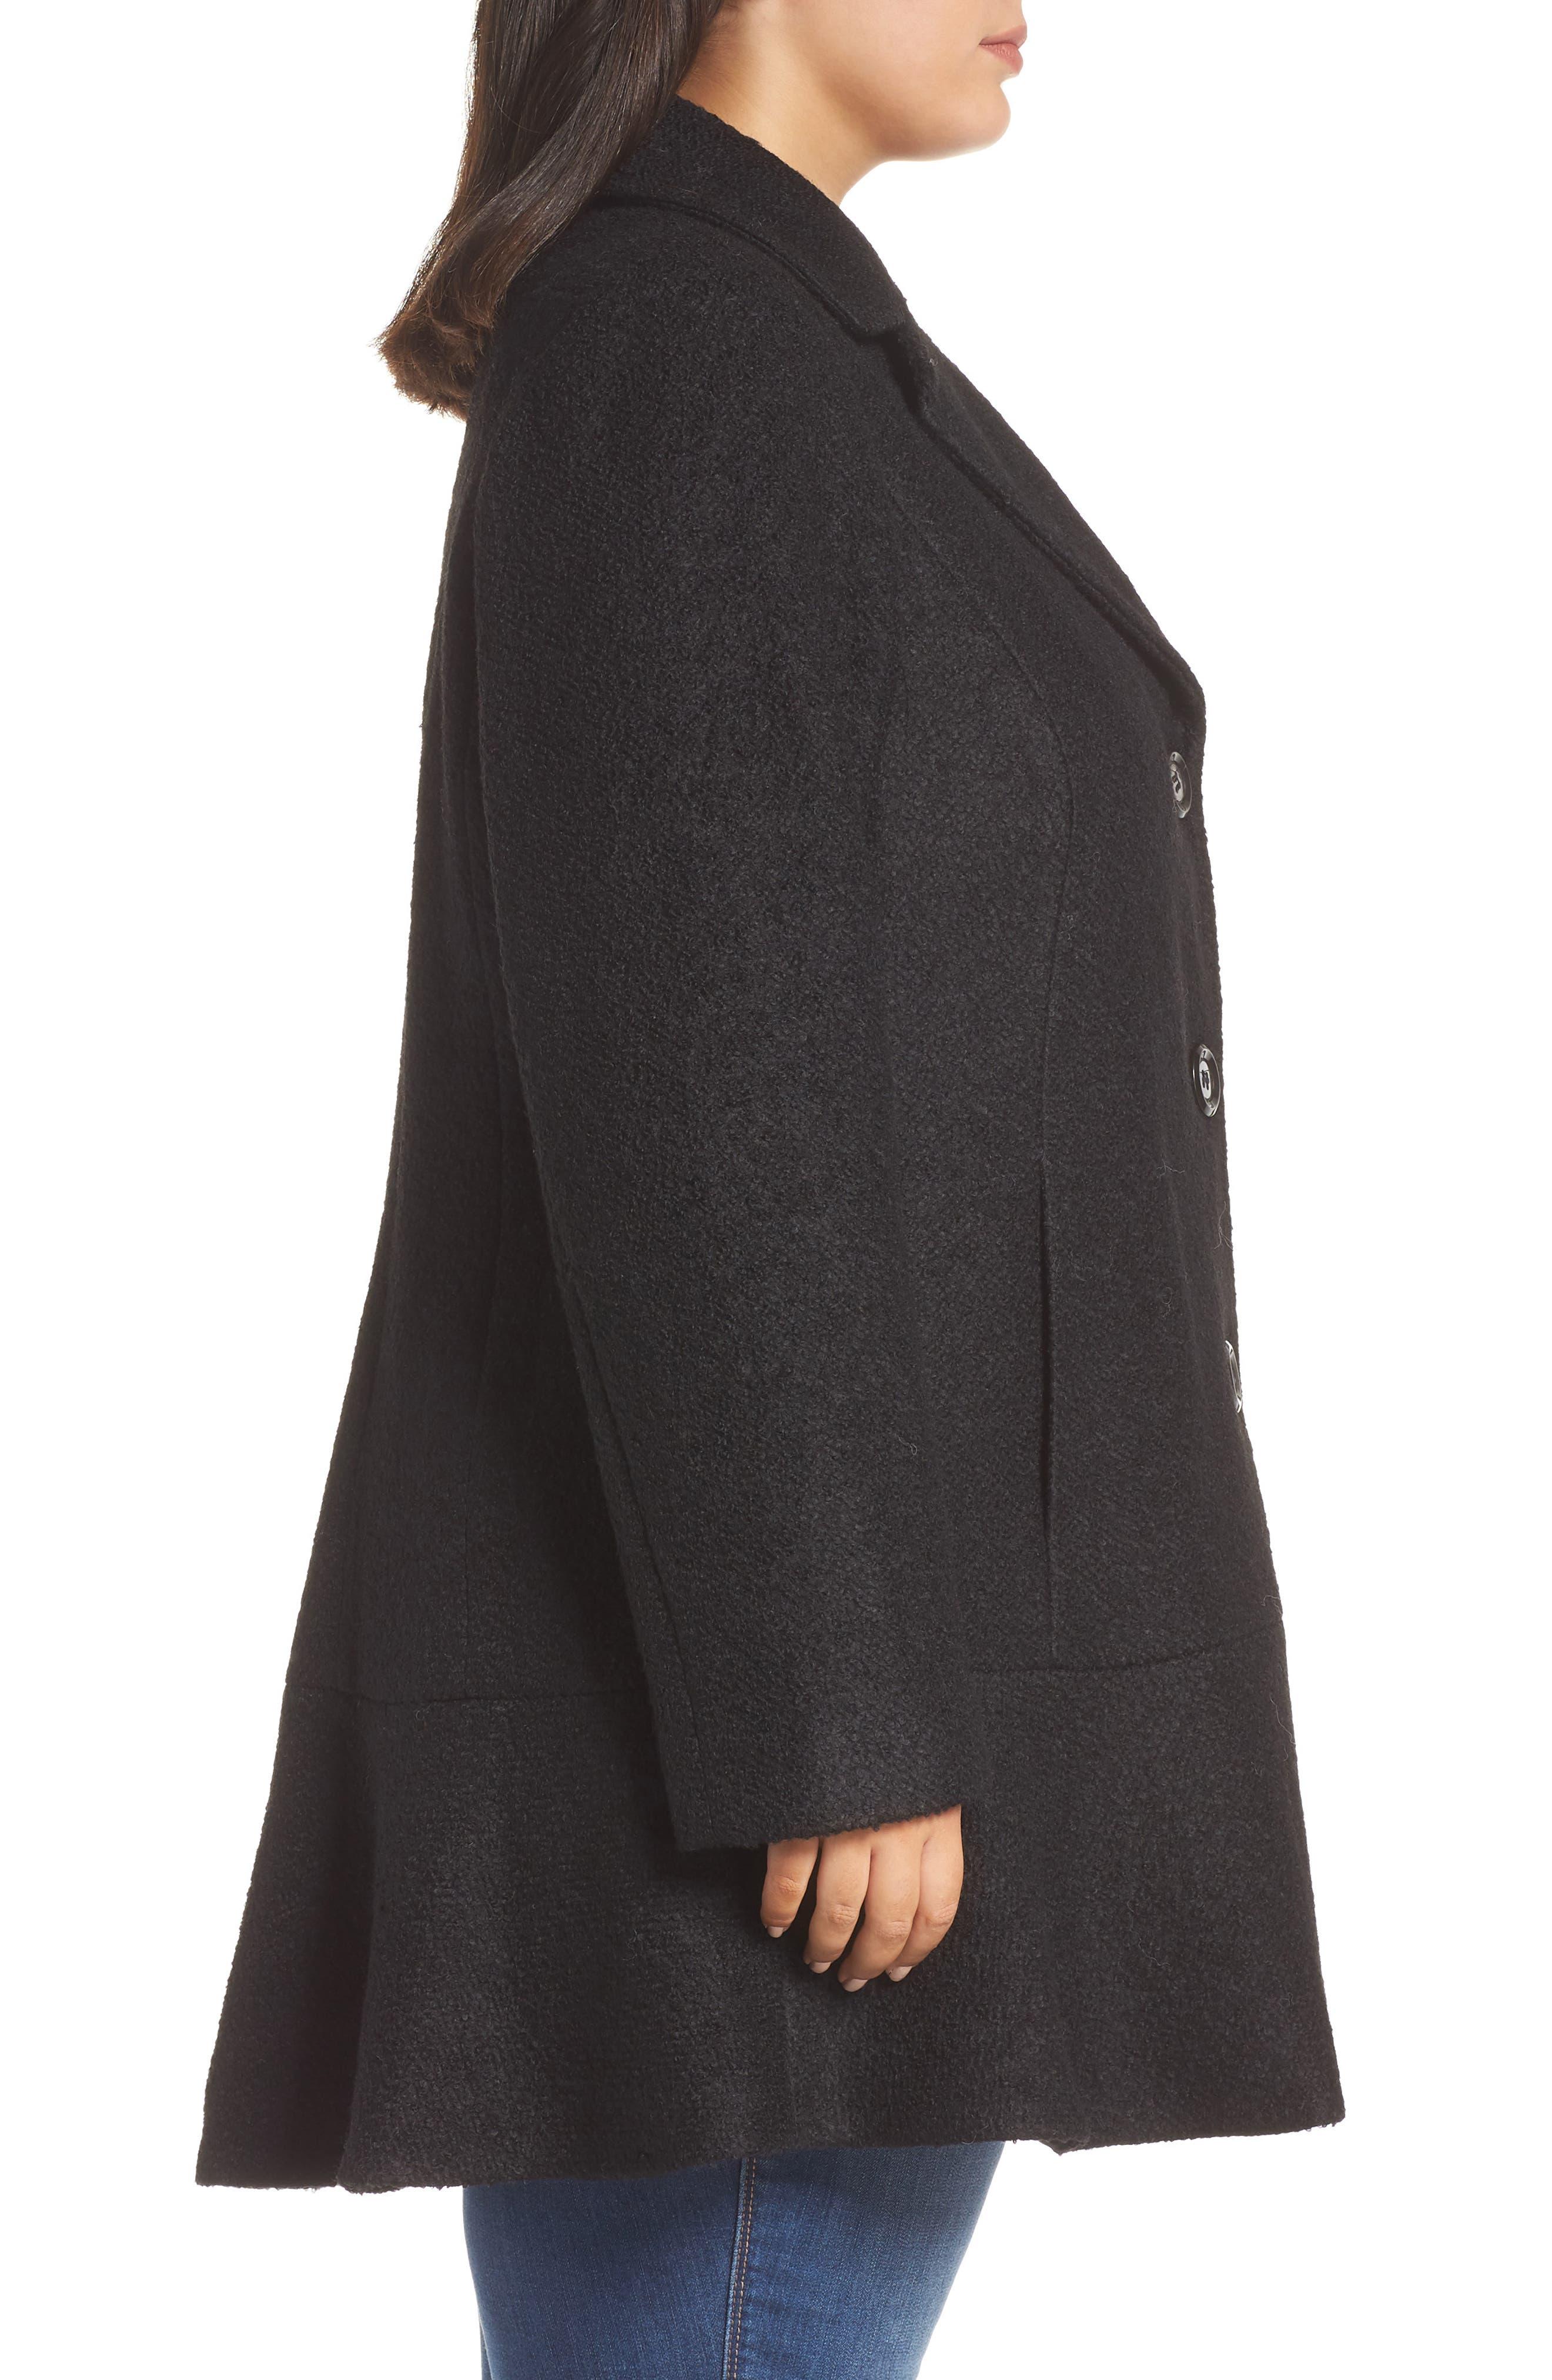 KENSIE, Notch Lapel Peplum Coat, Alternate thumbnail 4, color, BLACK